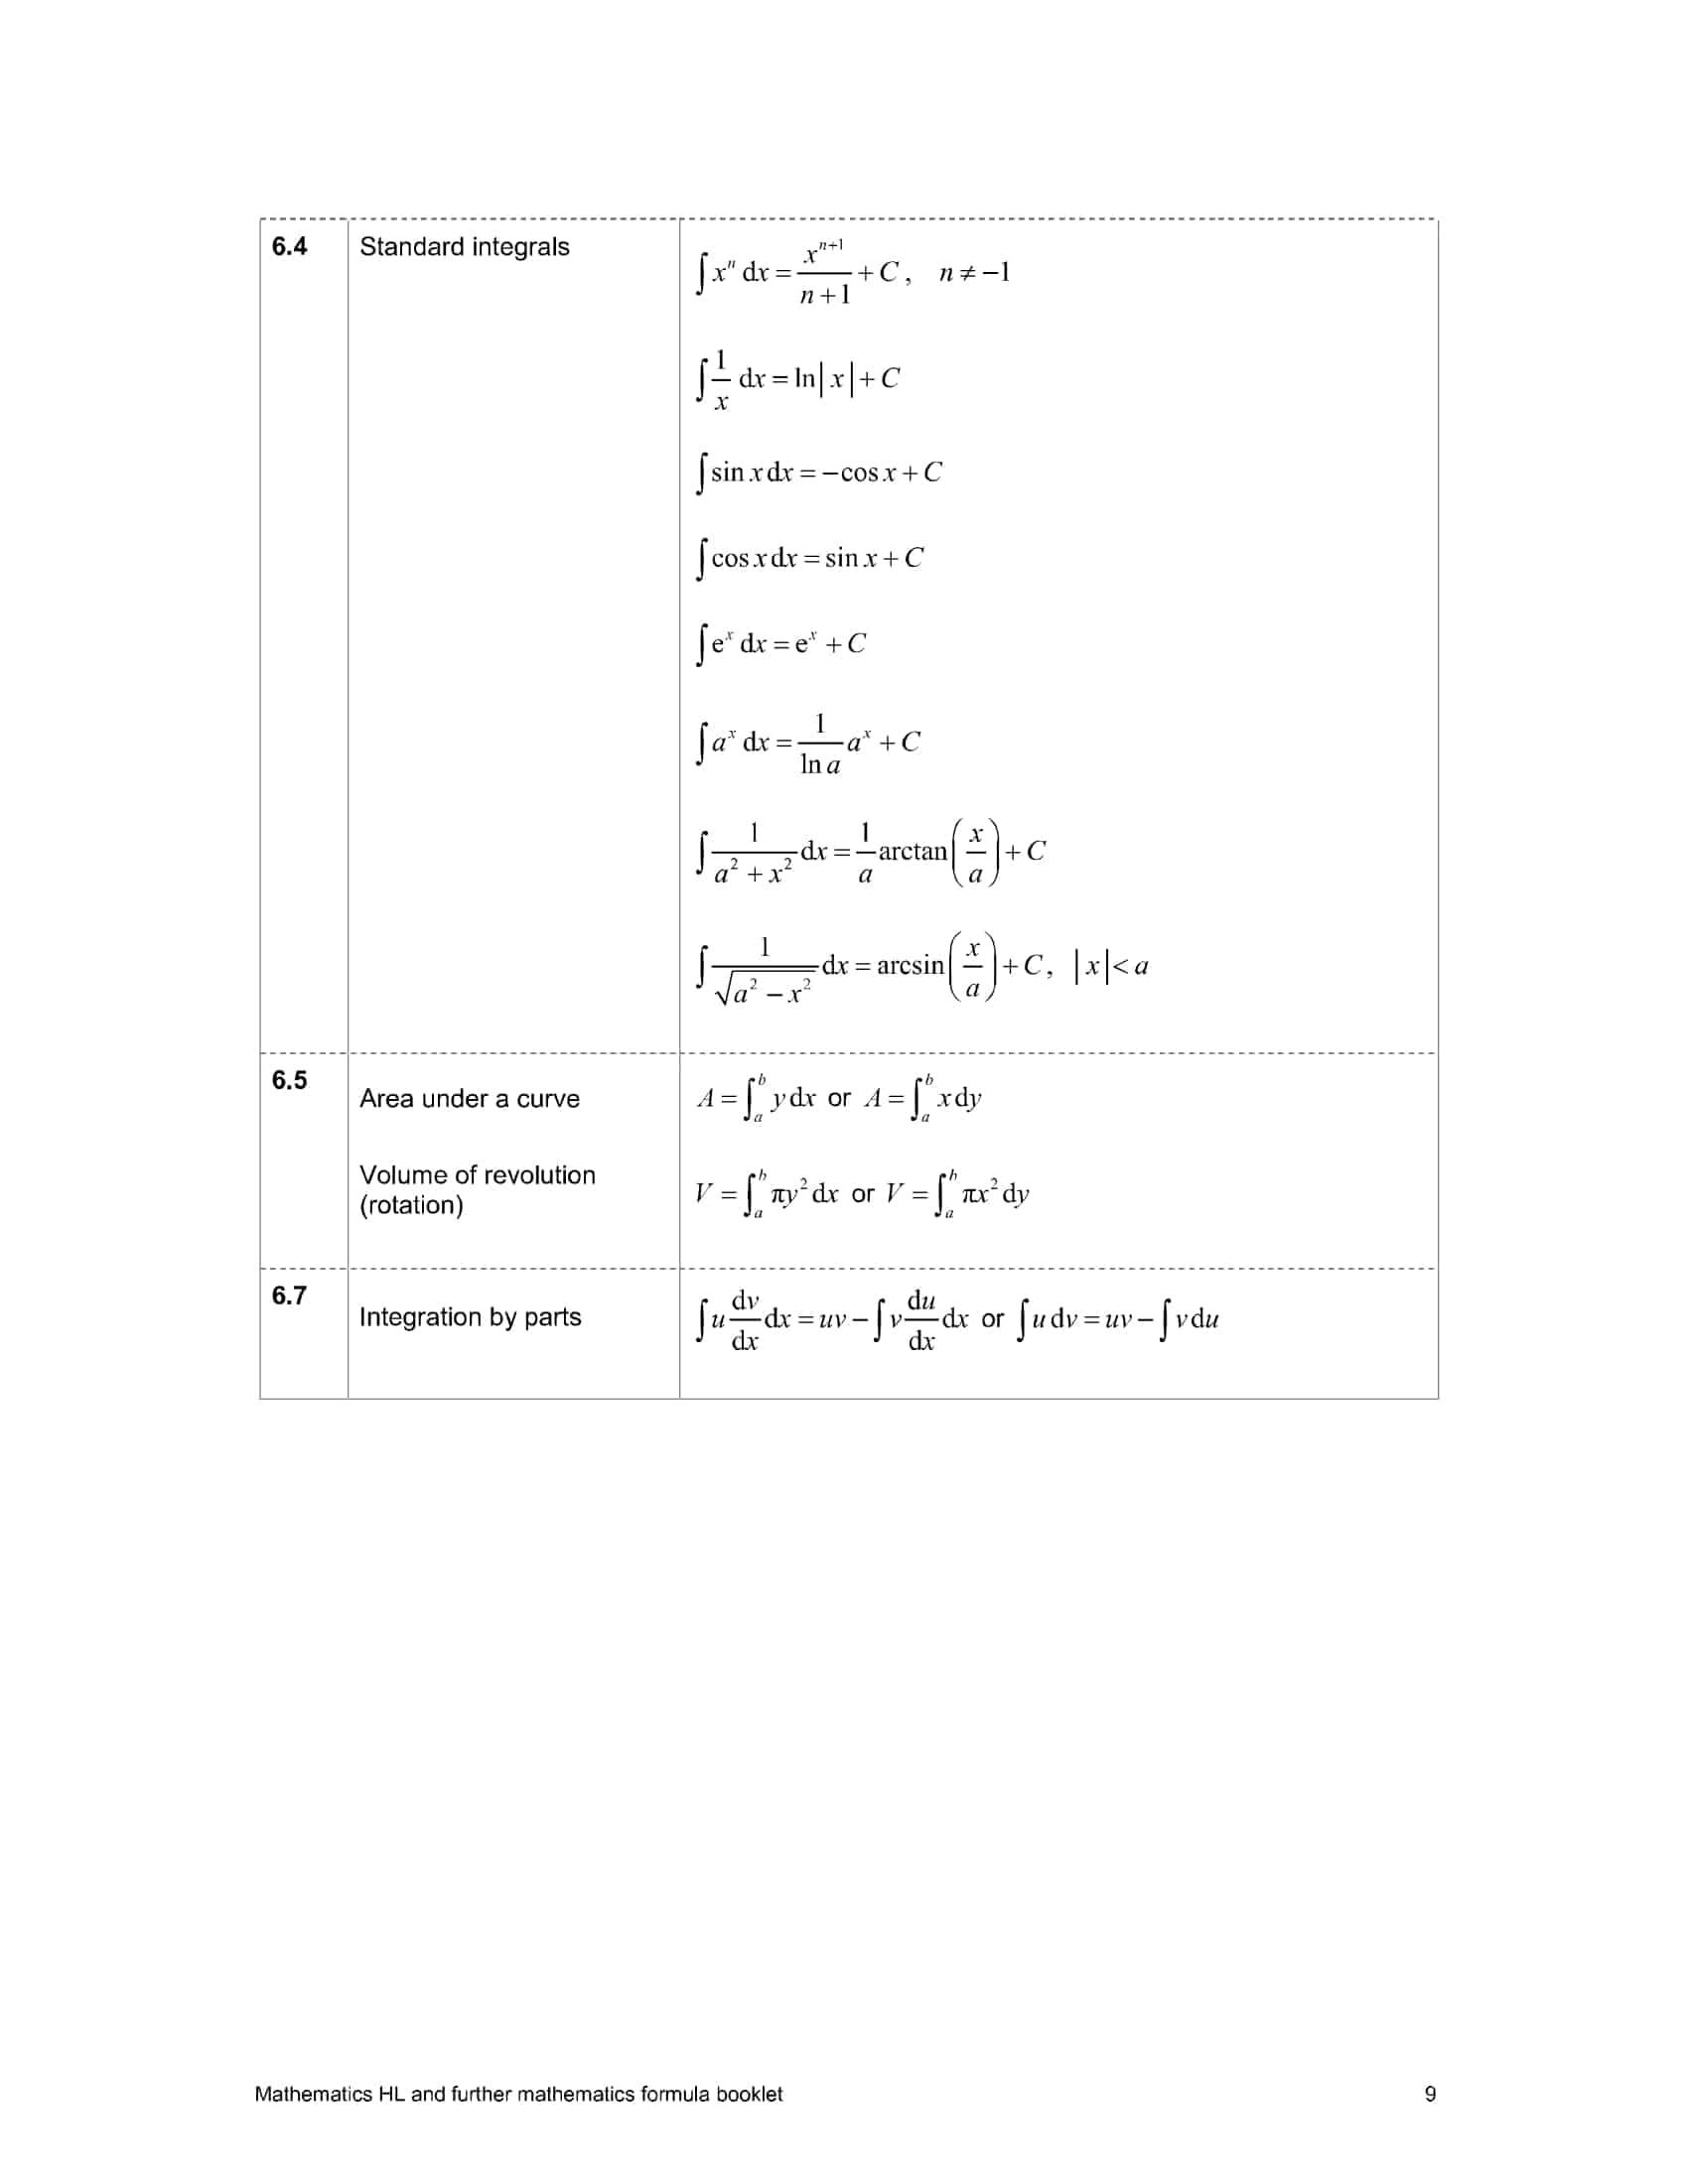 IB Math HL Formula Booklet-10